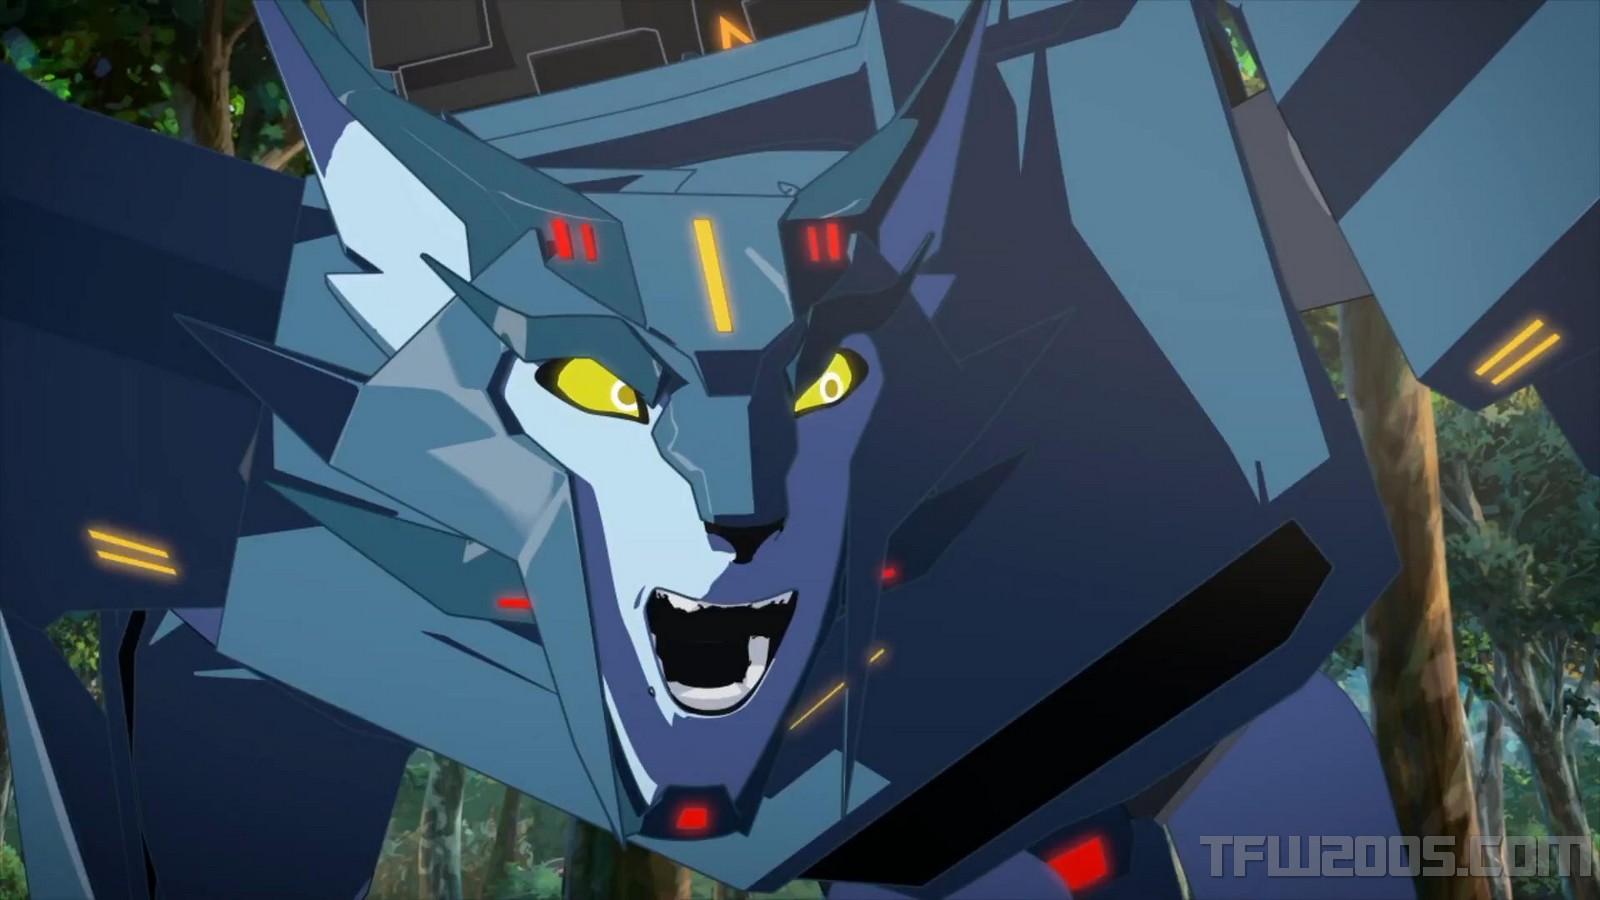 http://www.tfw2005.com/transformers-news/attach/7/3/8/6/3/Transformers-Robots-in-Disguise---Season-1-Trailer-90_1412784573.jpg